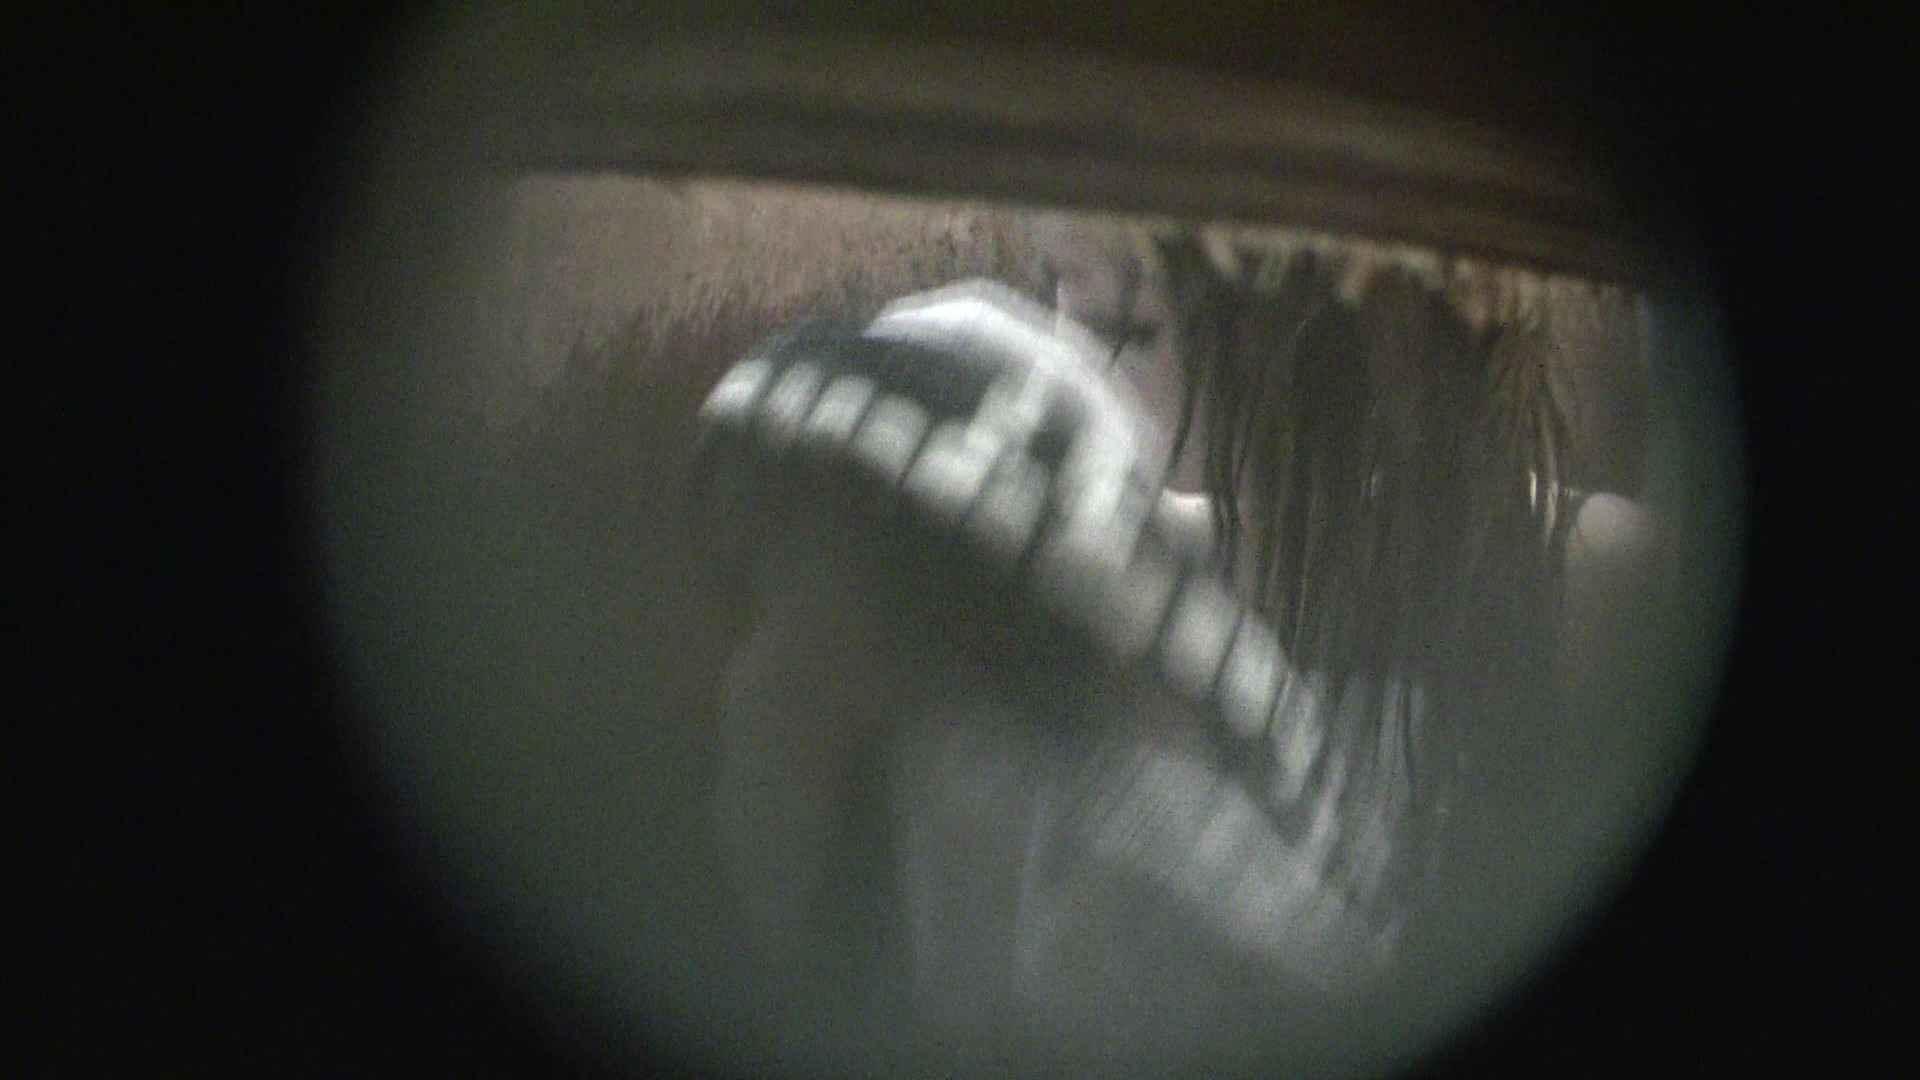 NO.03 ムッチリ色白ボディーに少し大きな乳輪 シャワー スケベ動画紹介 90枚 19